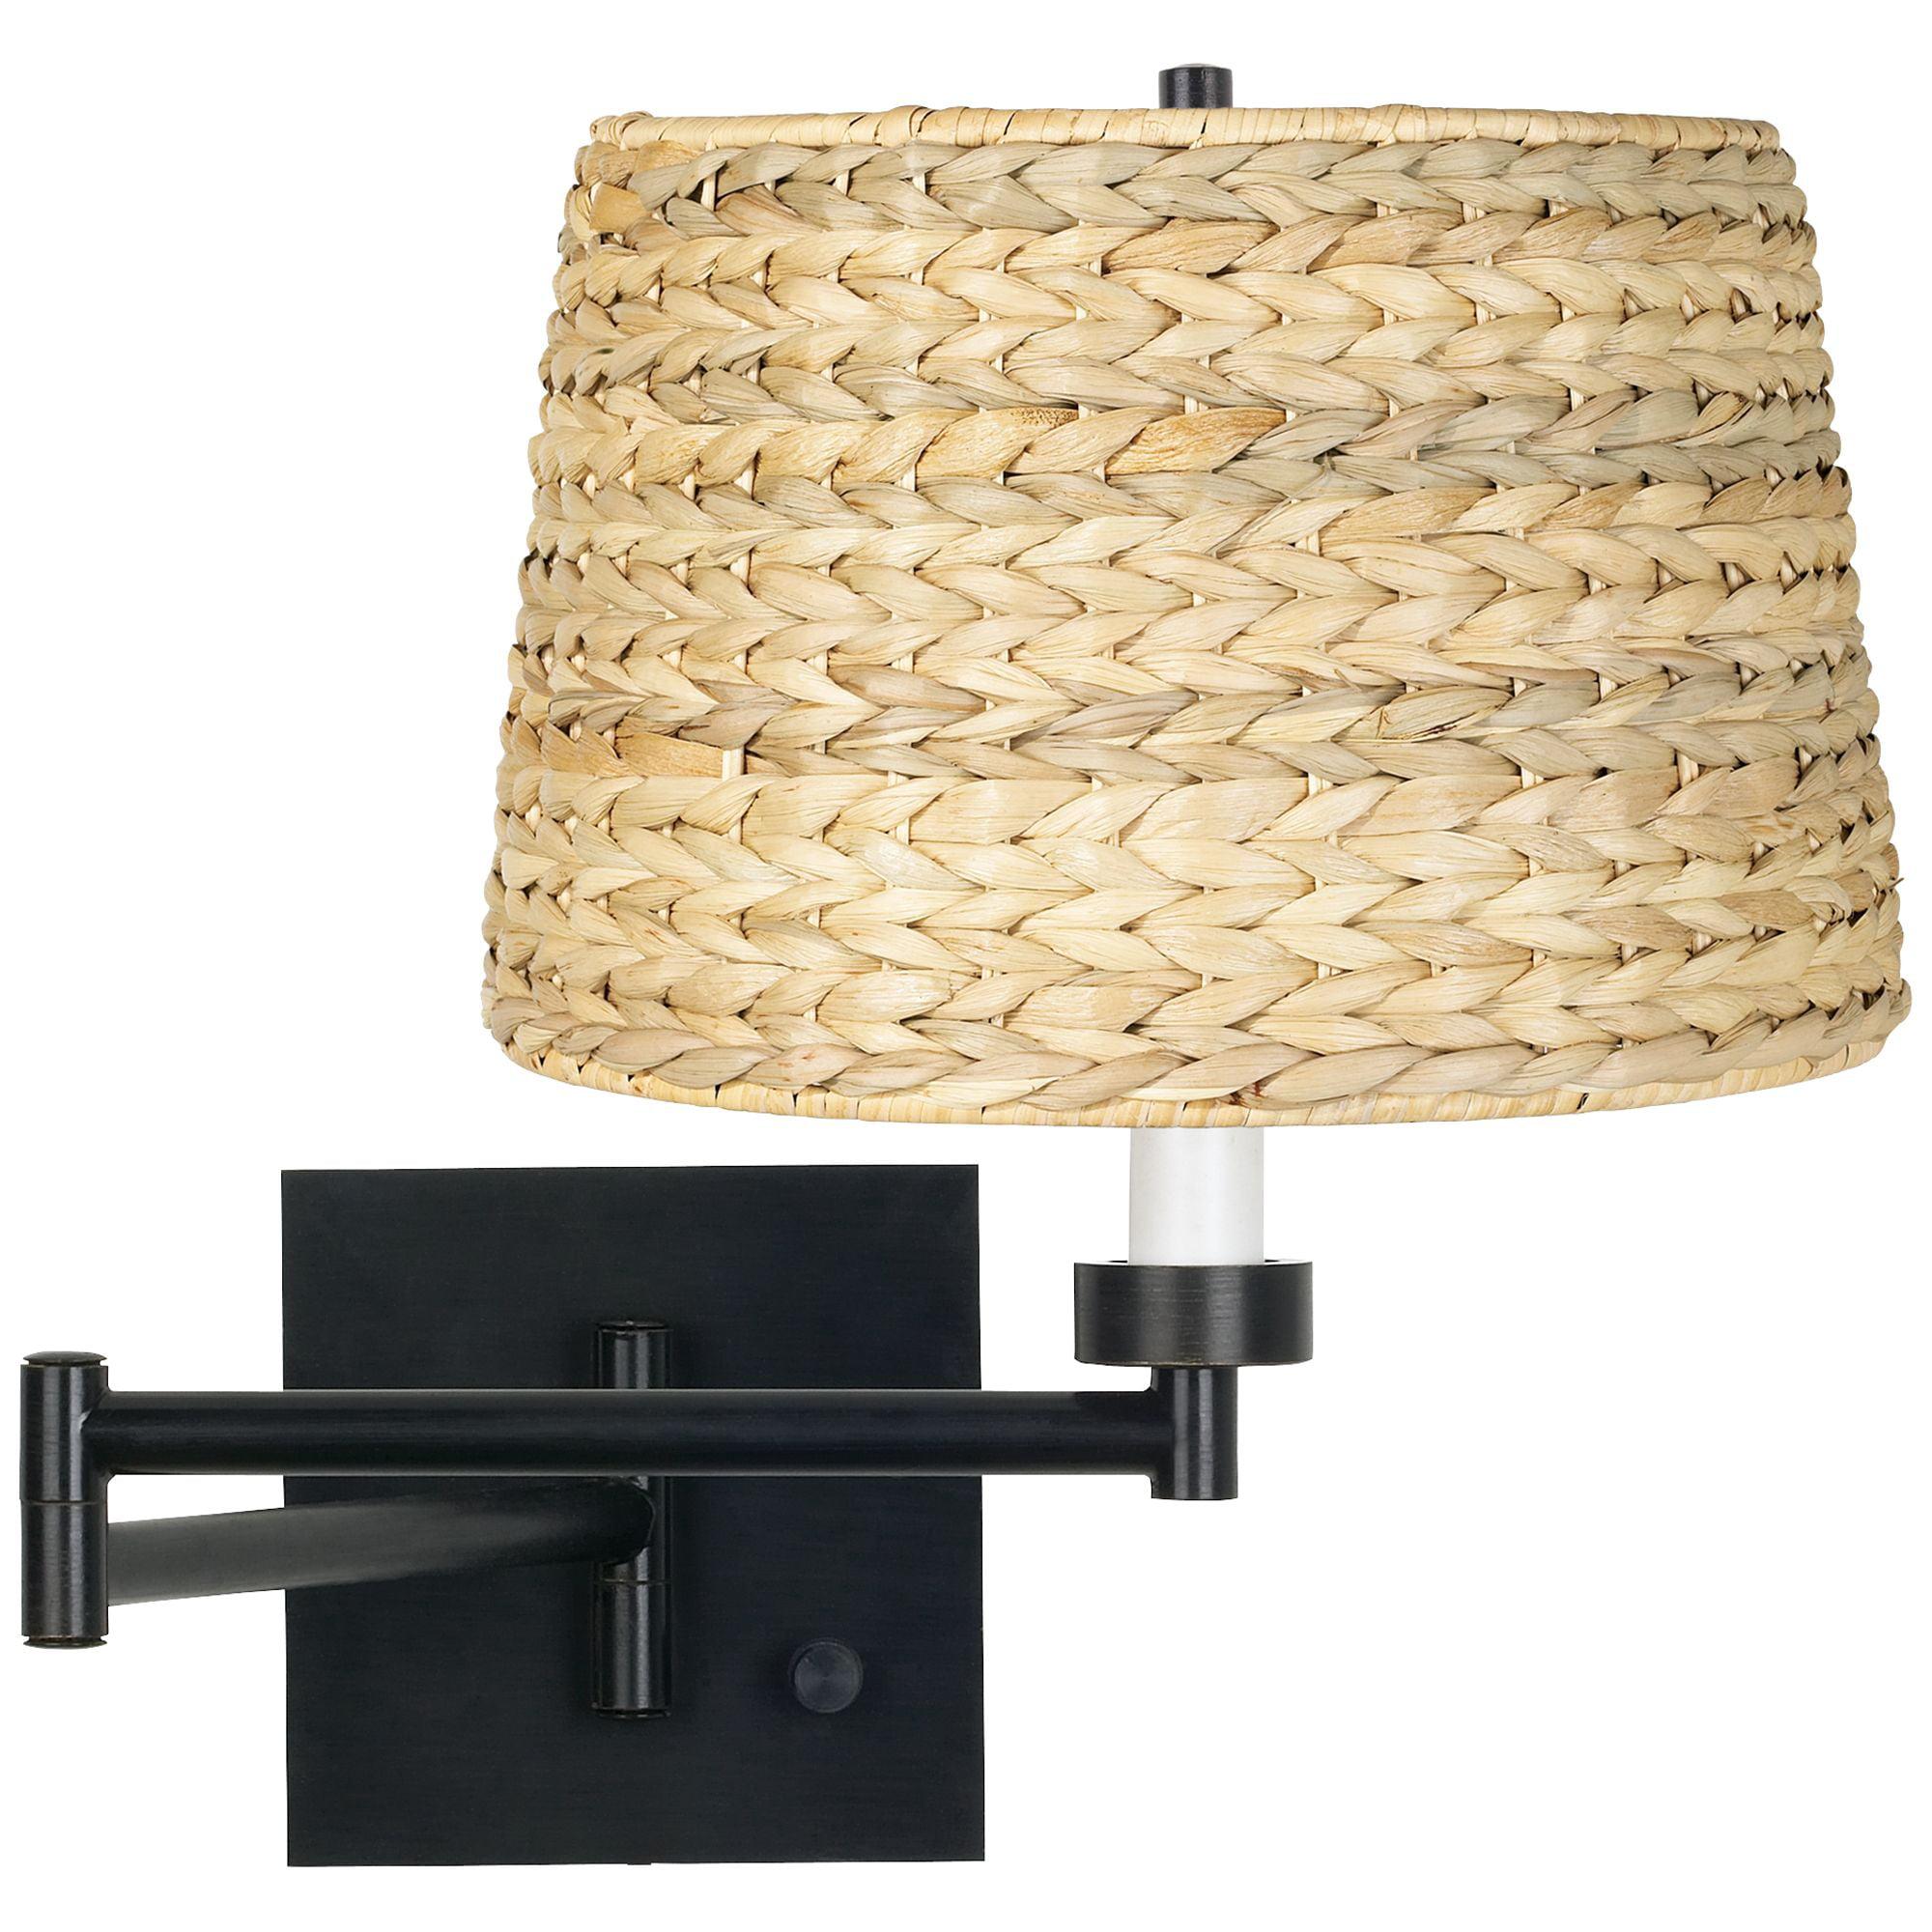 Franklin Iron Works Modern Swing Arm Wall Lamp Espresso Plug In Light Fixture Woven Seagrass Drum Shade For Bedroom Living Room Walmart Com Walmart Com